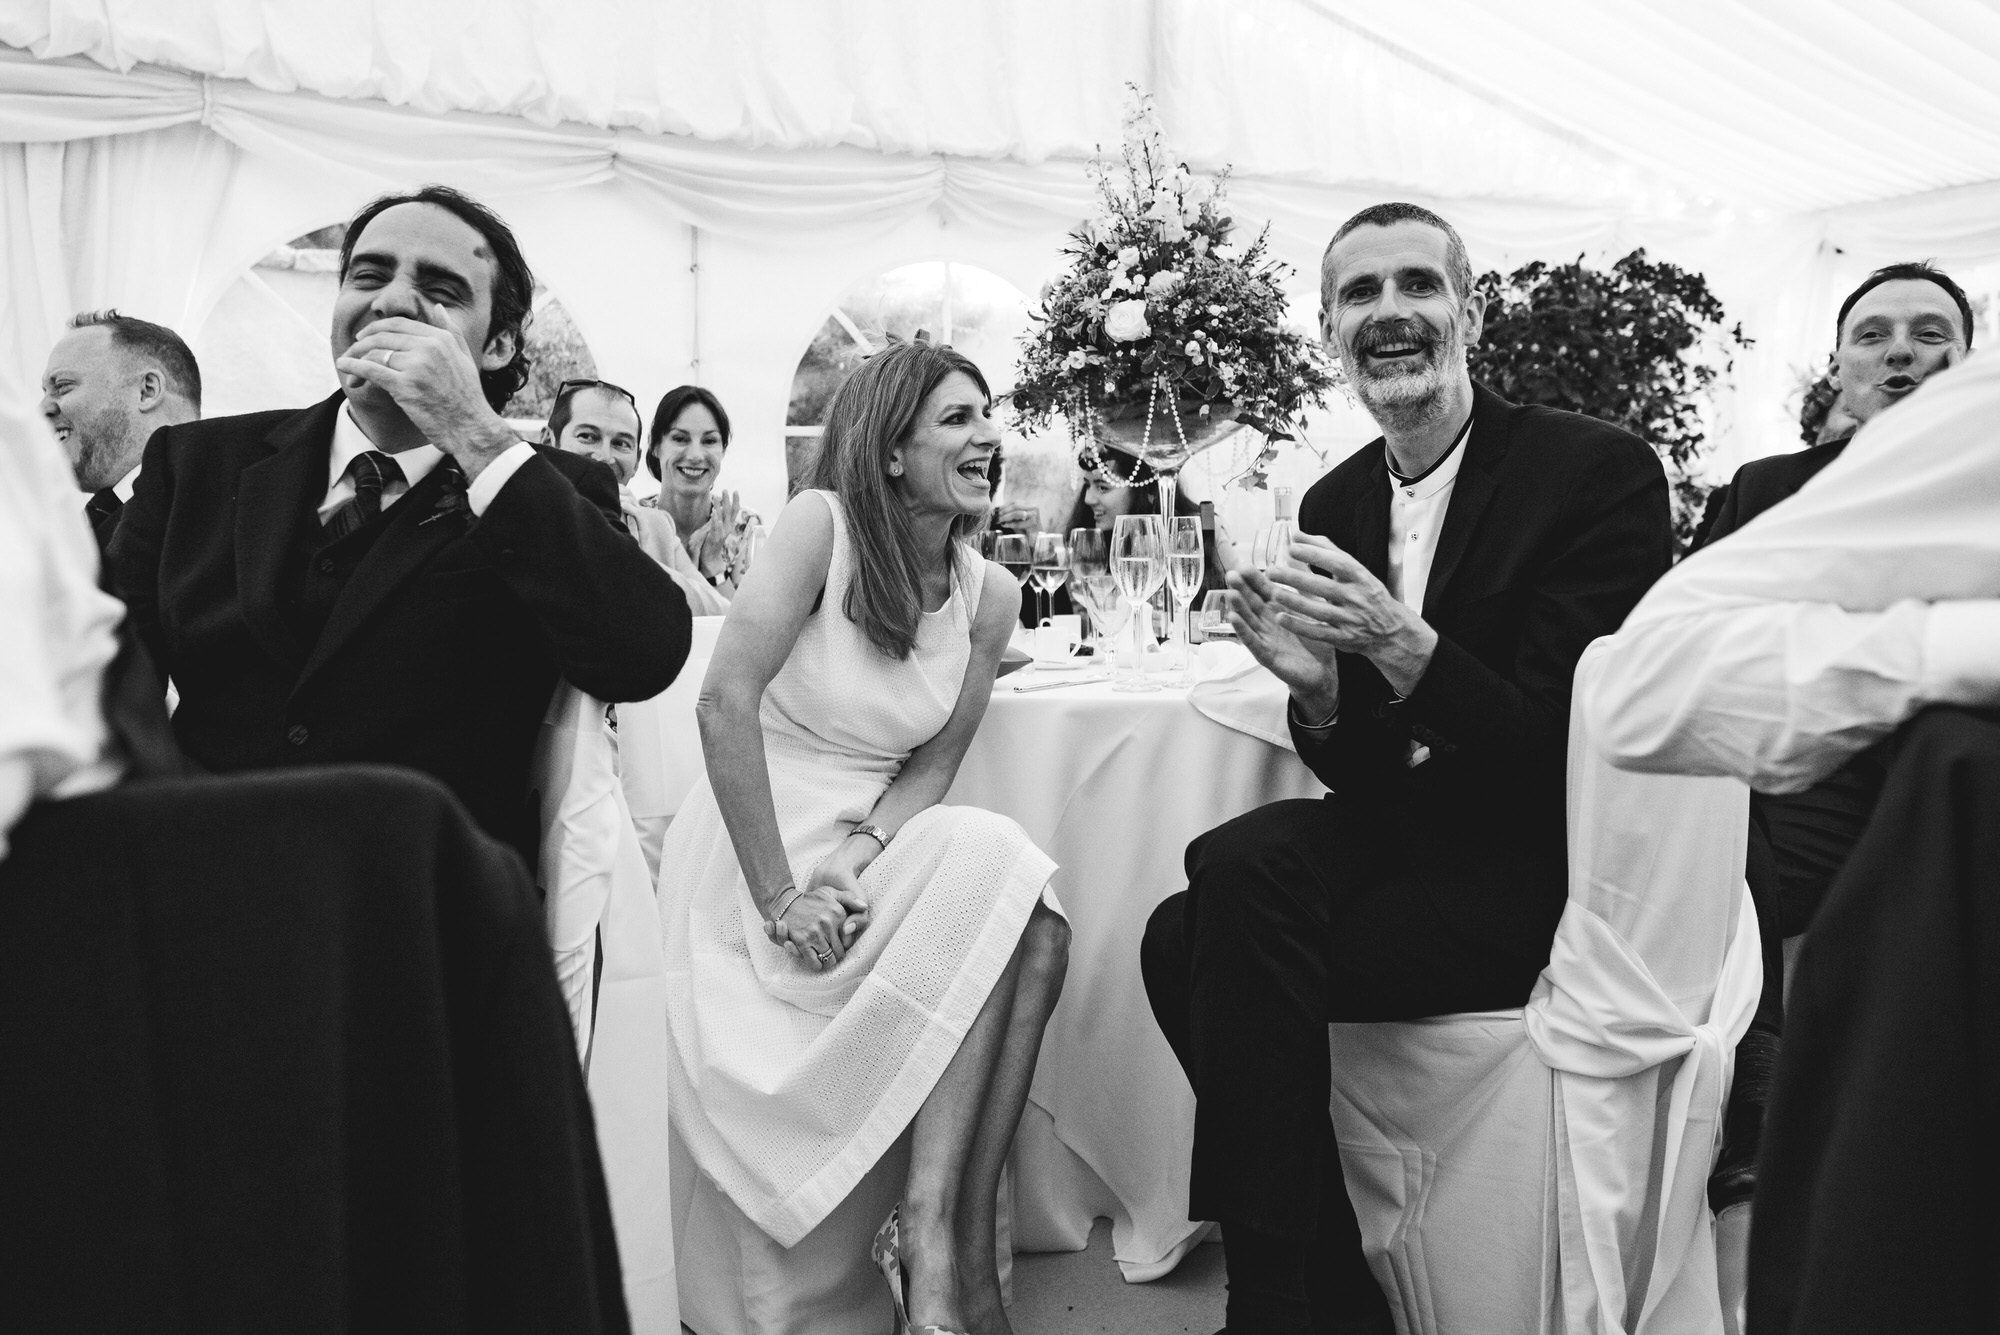 Dorset marquee wedding by the sea simon biffen photography 45